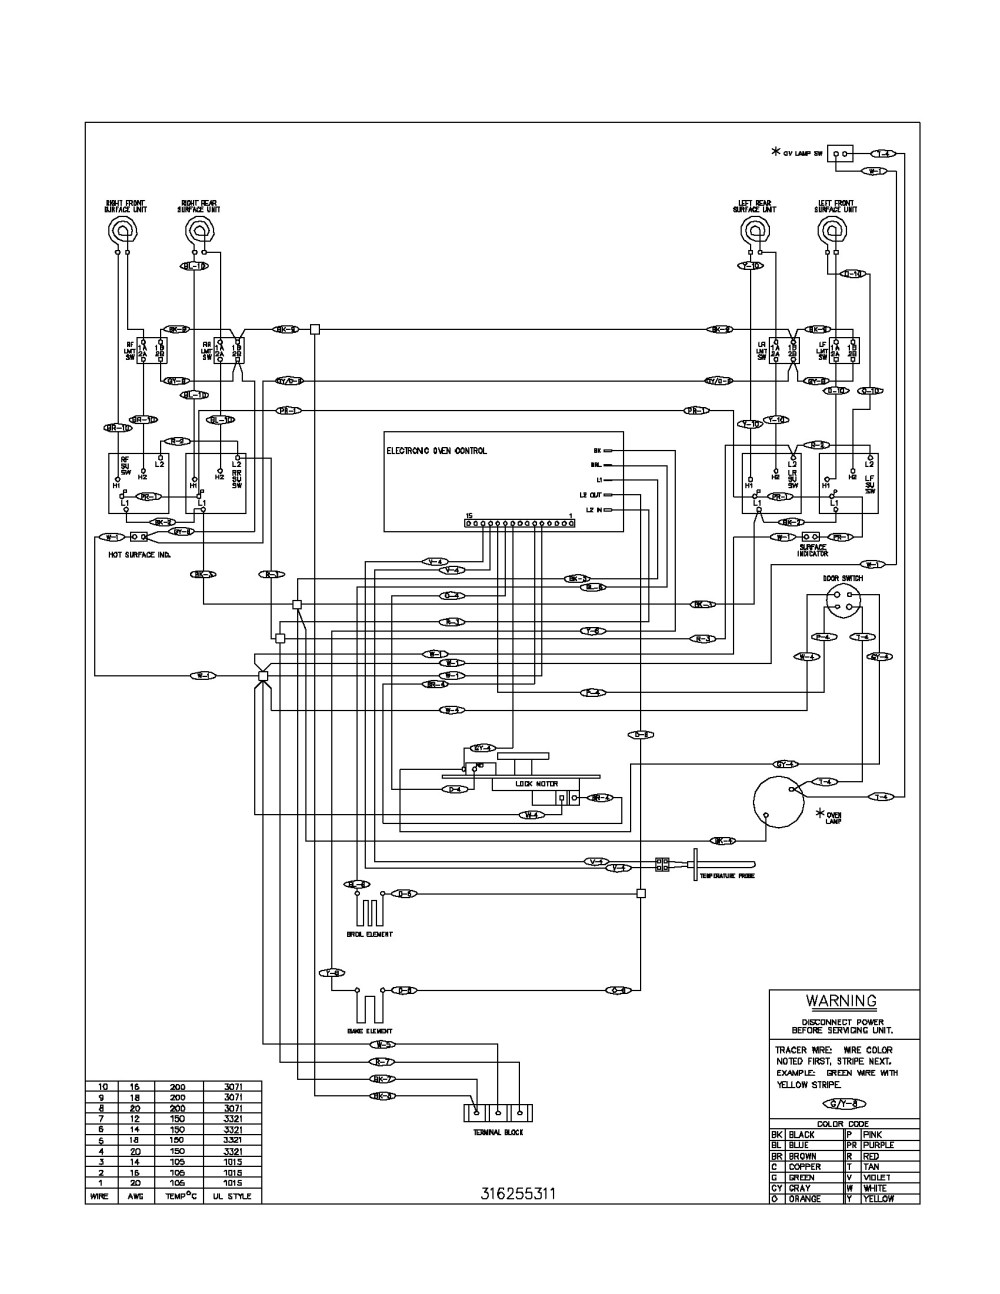 medium resolution of wiring diagram for electric cooktop wiring diagram for you wiring general cooktop diagrams electric jsp46sp1ss